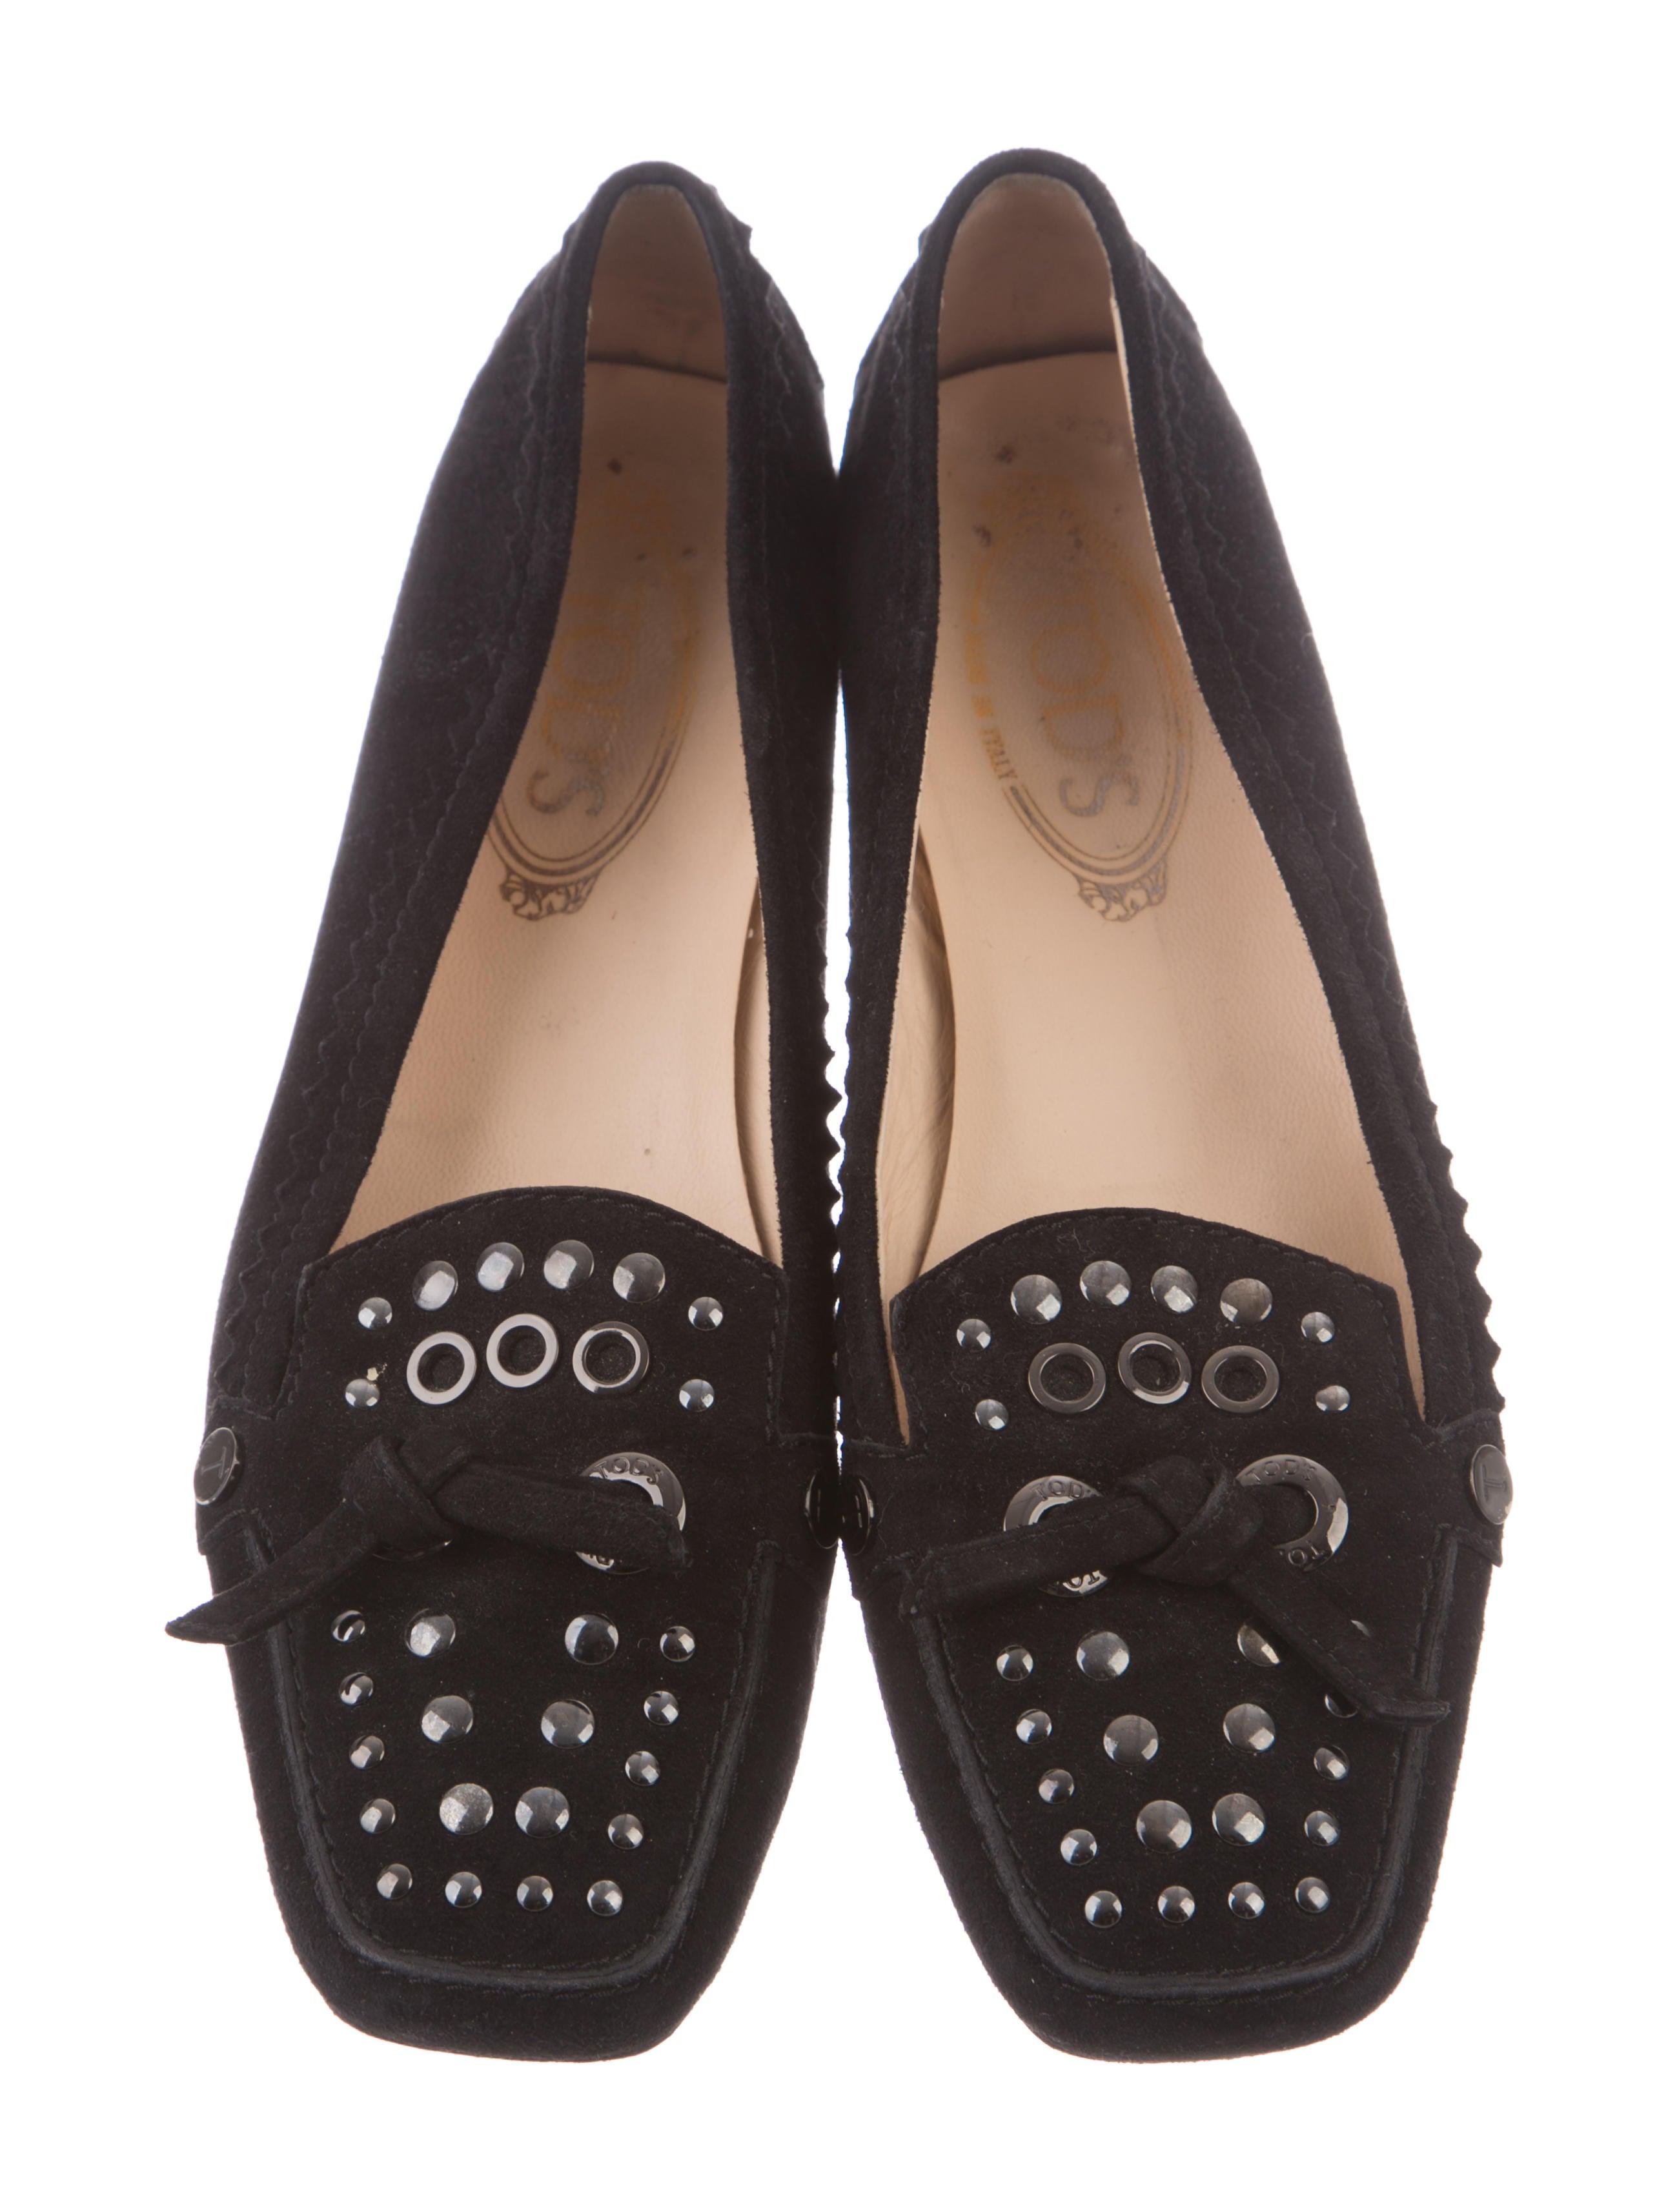 Tod's Kate Studded Loafers sale buy amazing price online sjyV4U